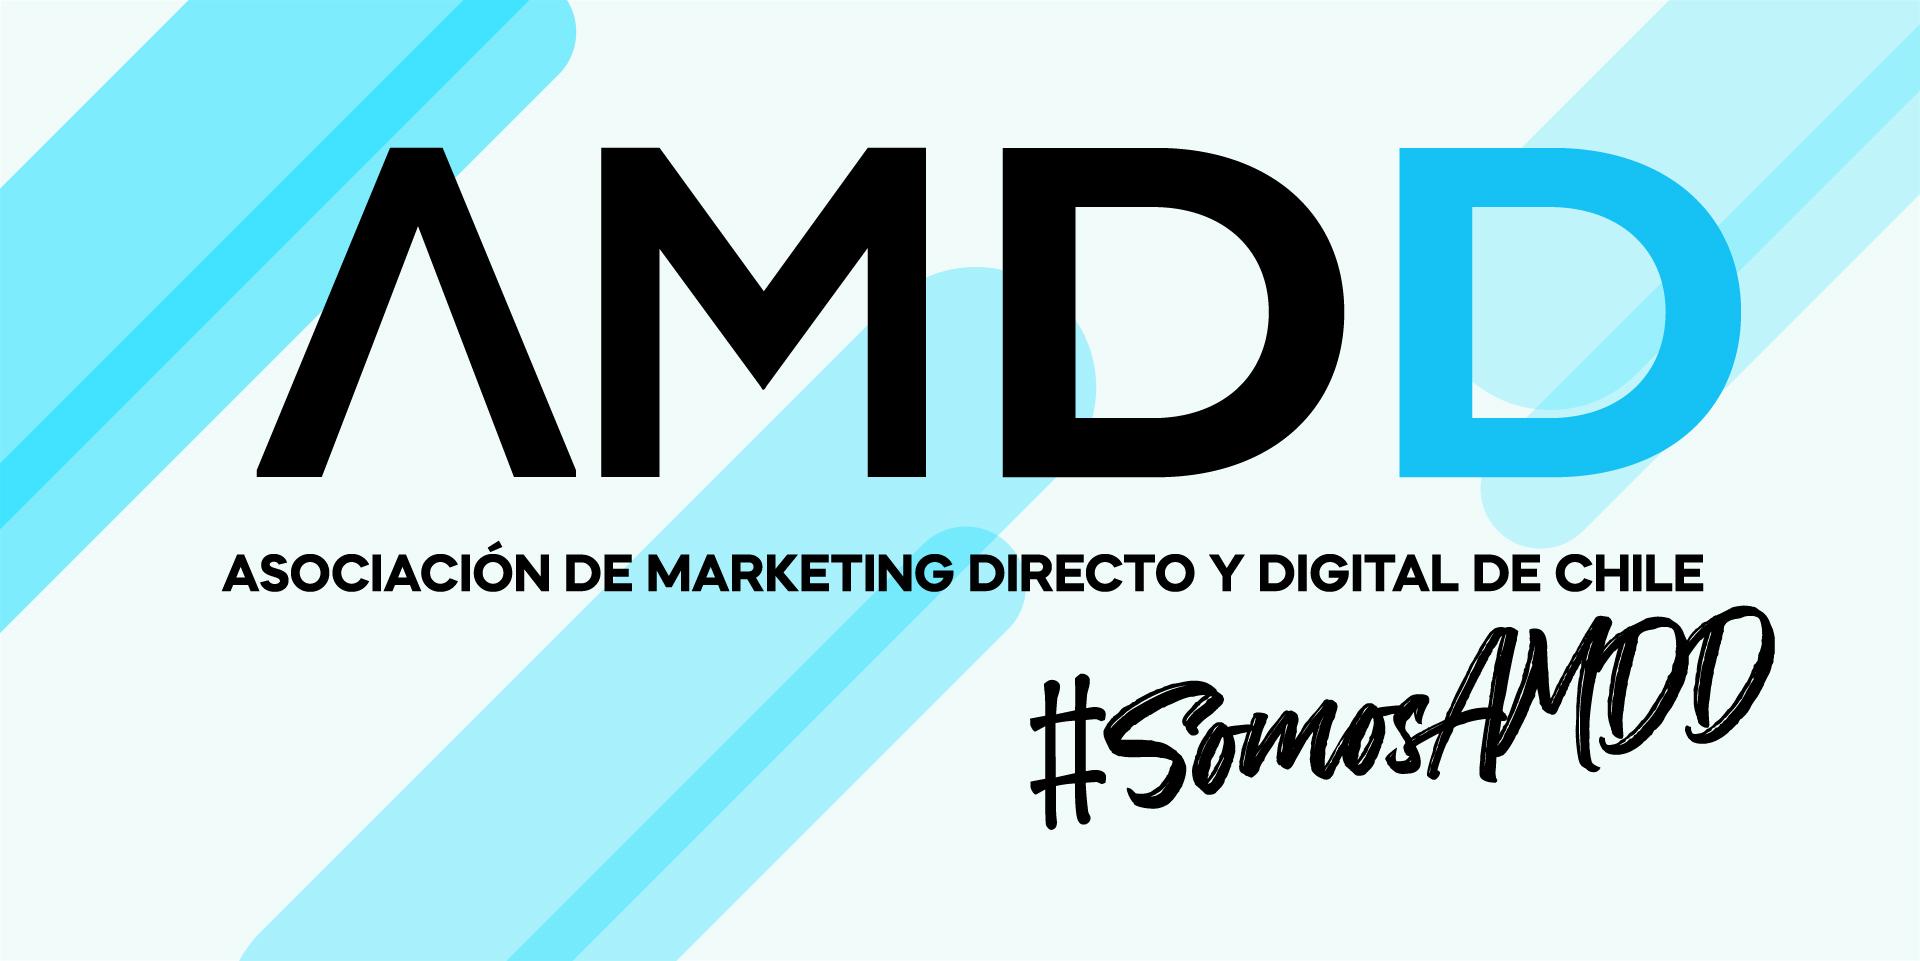 SomosAMDD_logo